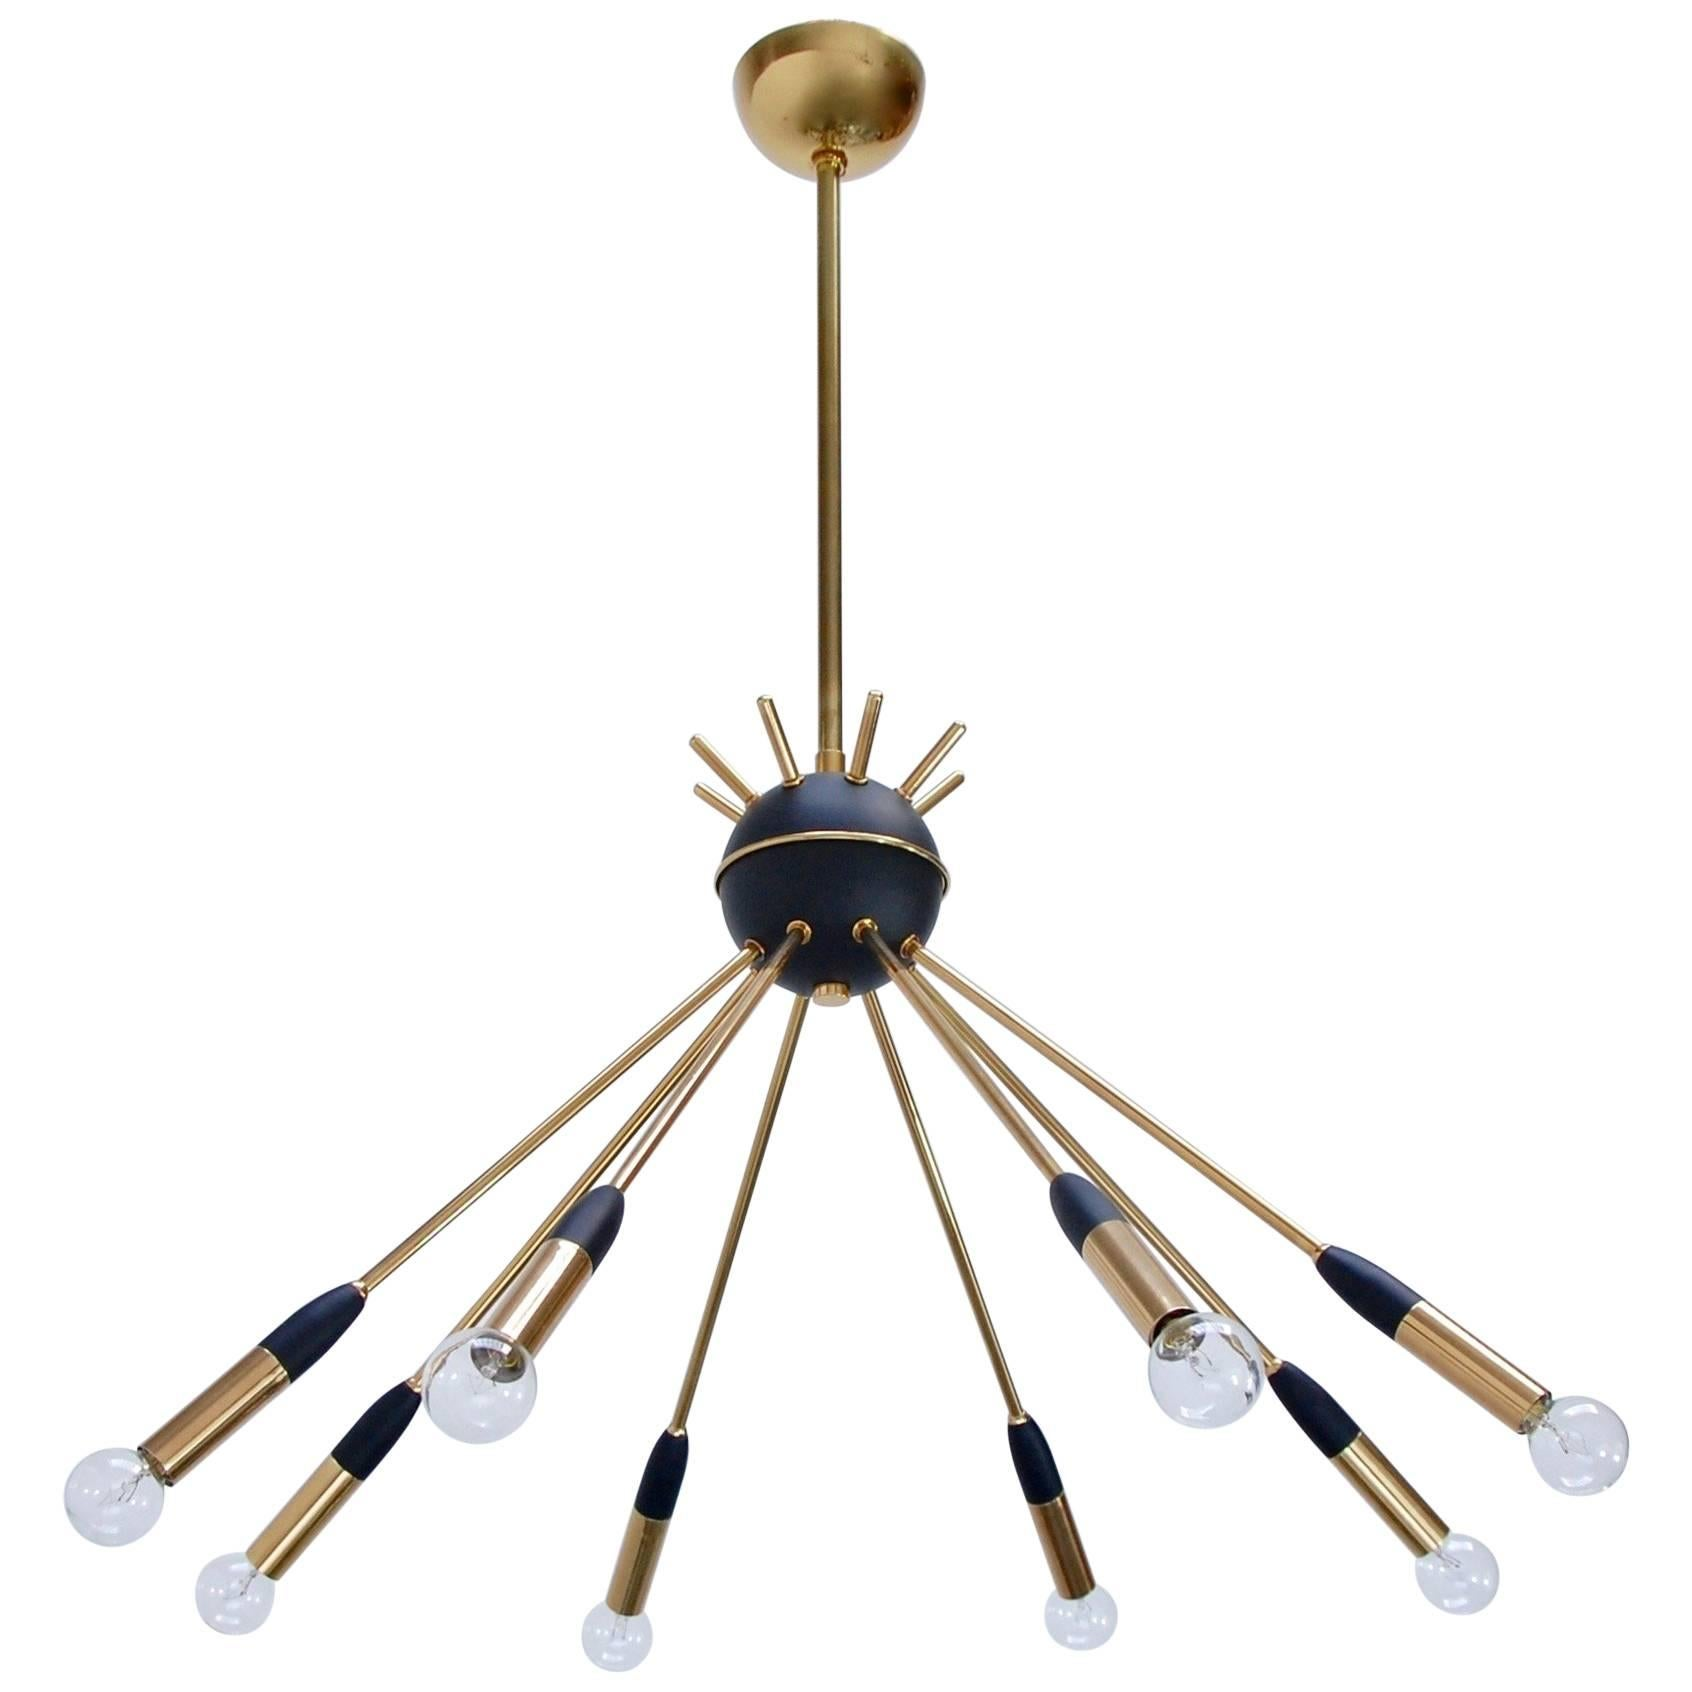 1950s Italian Sputnik